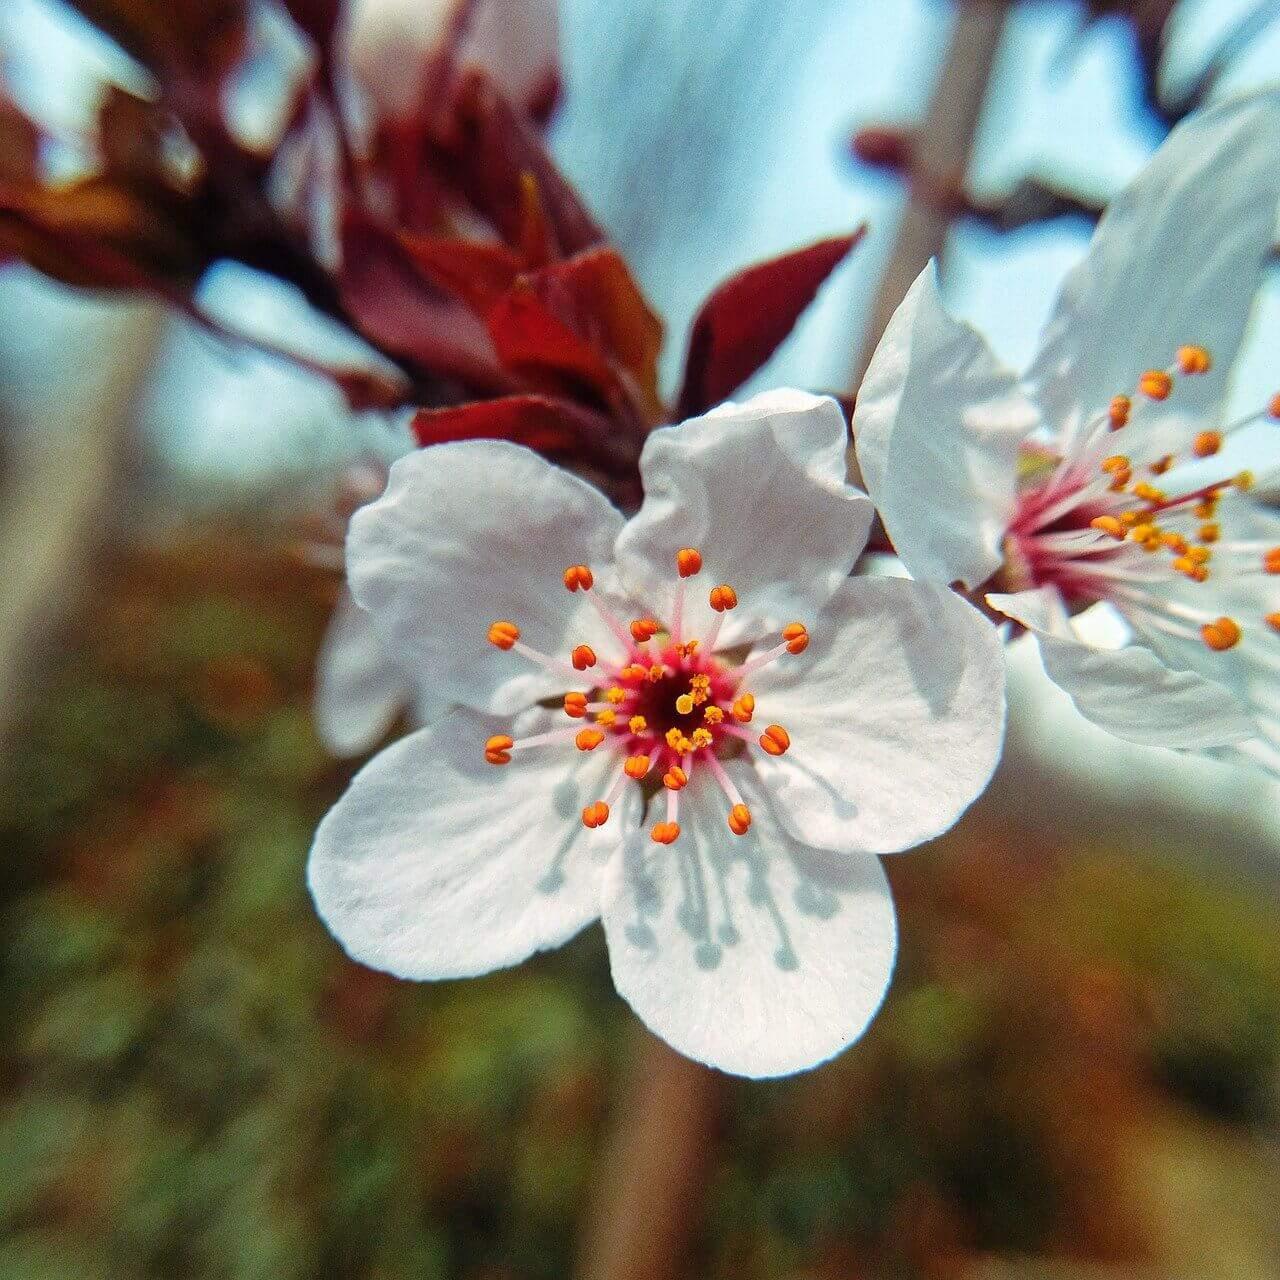 Lily 'cherrywood'